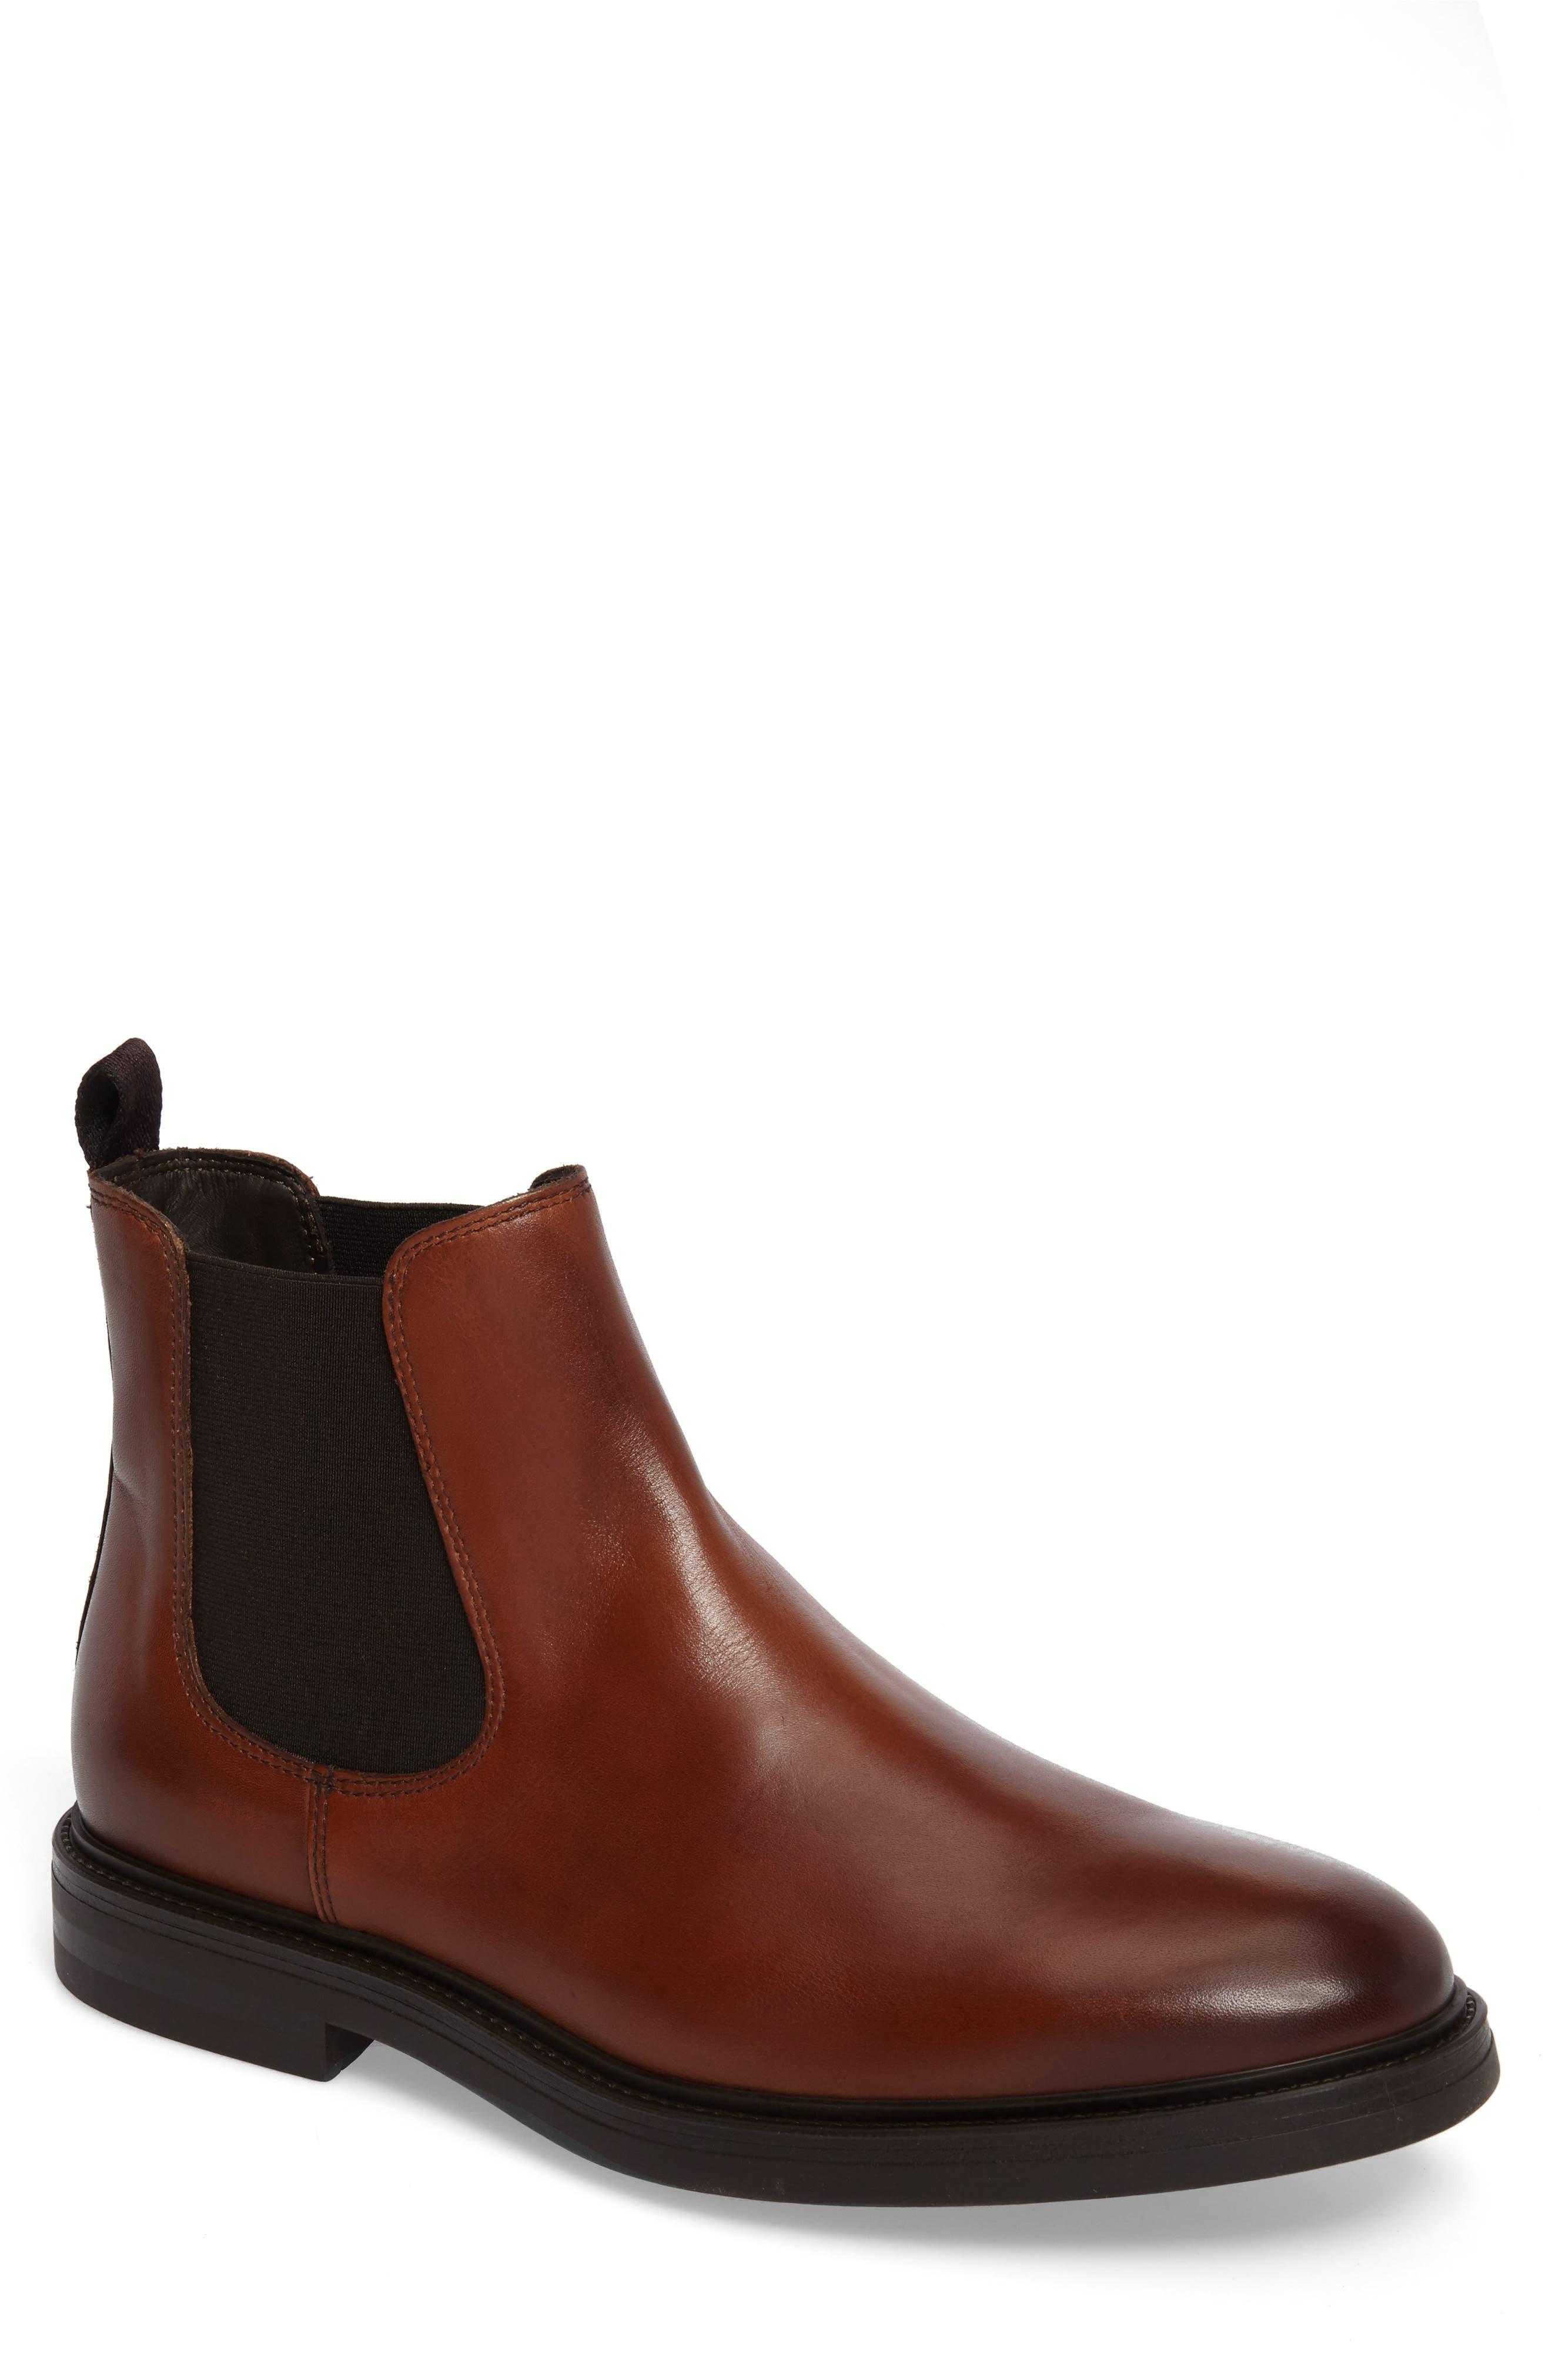 Chelsea Boot,                         Main,                         color, Caramel